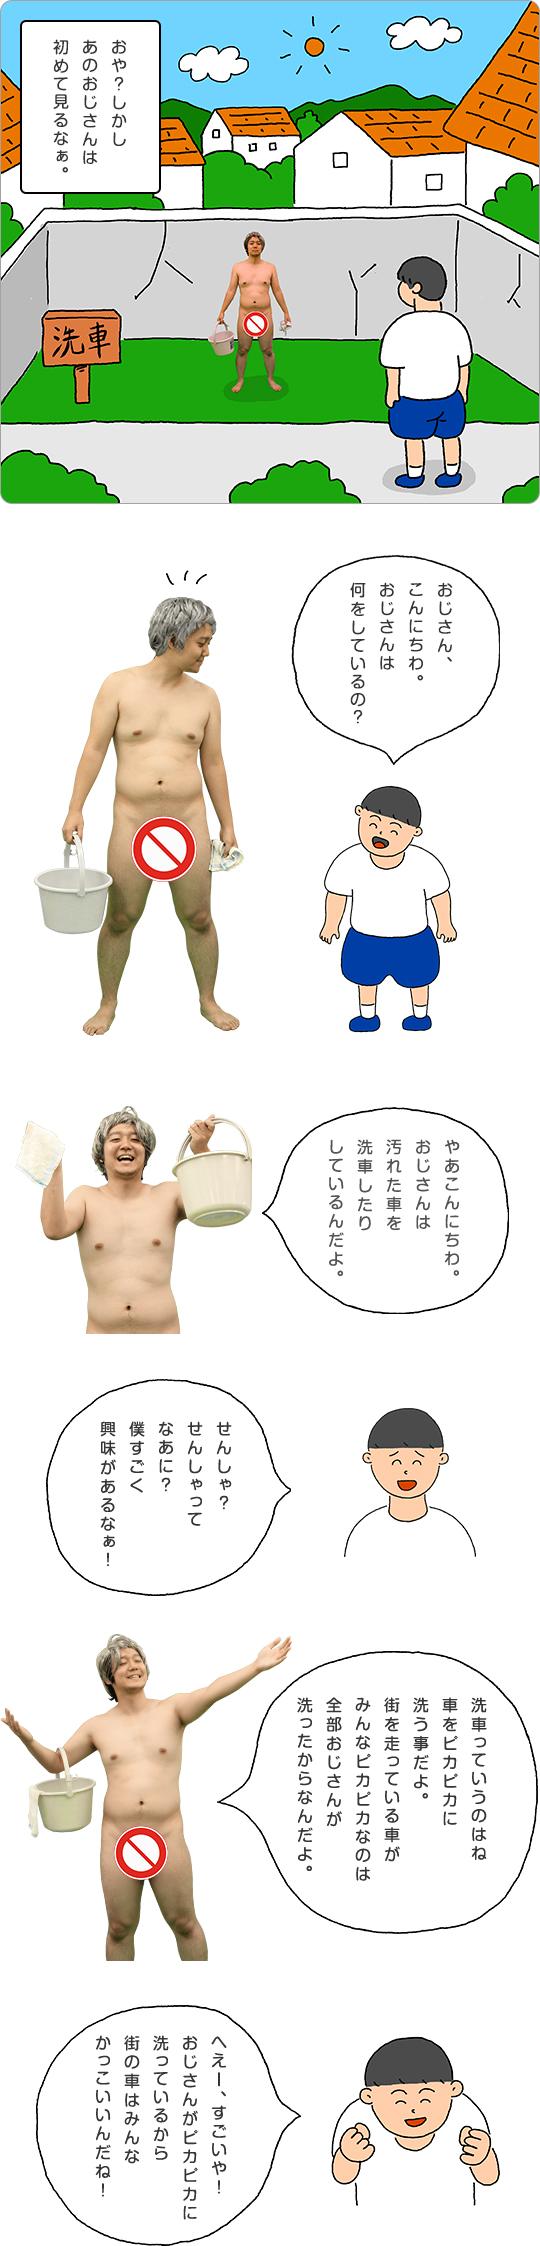 morioka_sensha_02.jpg